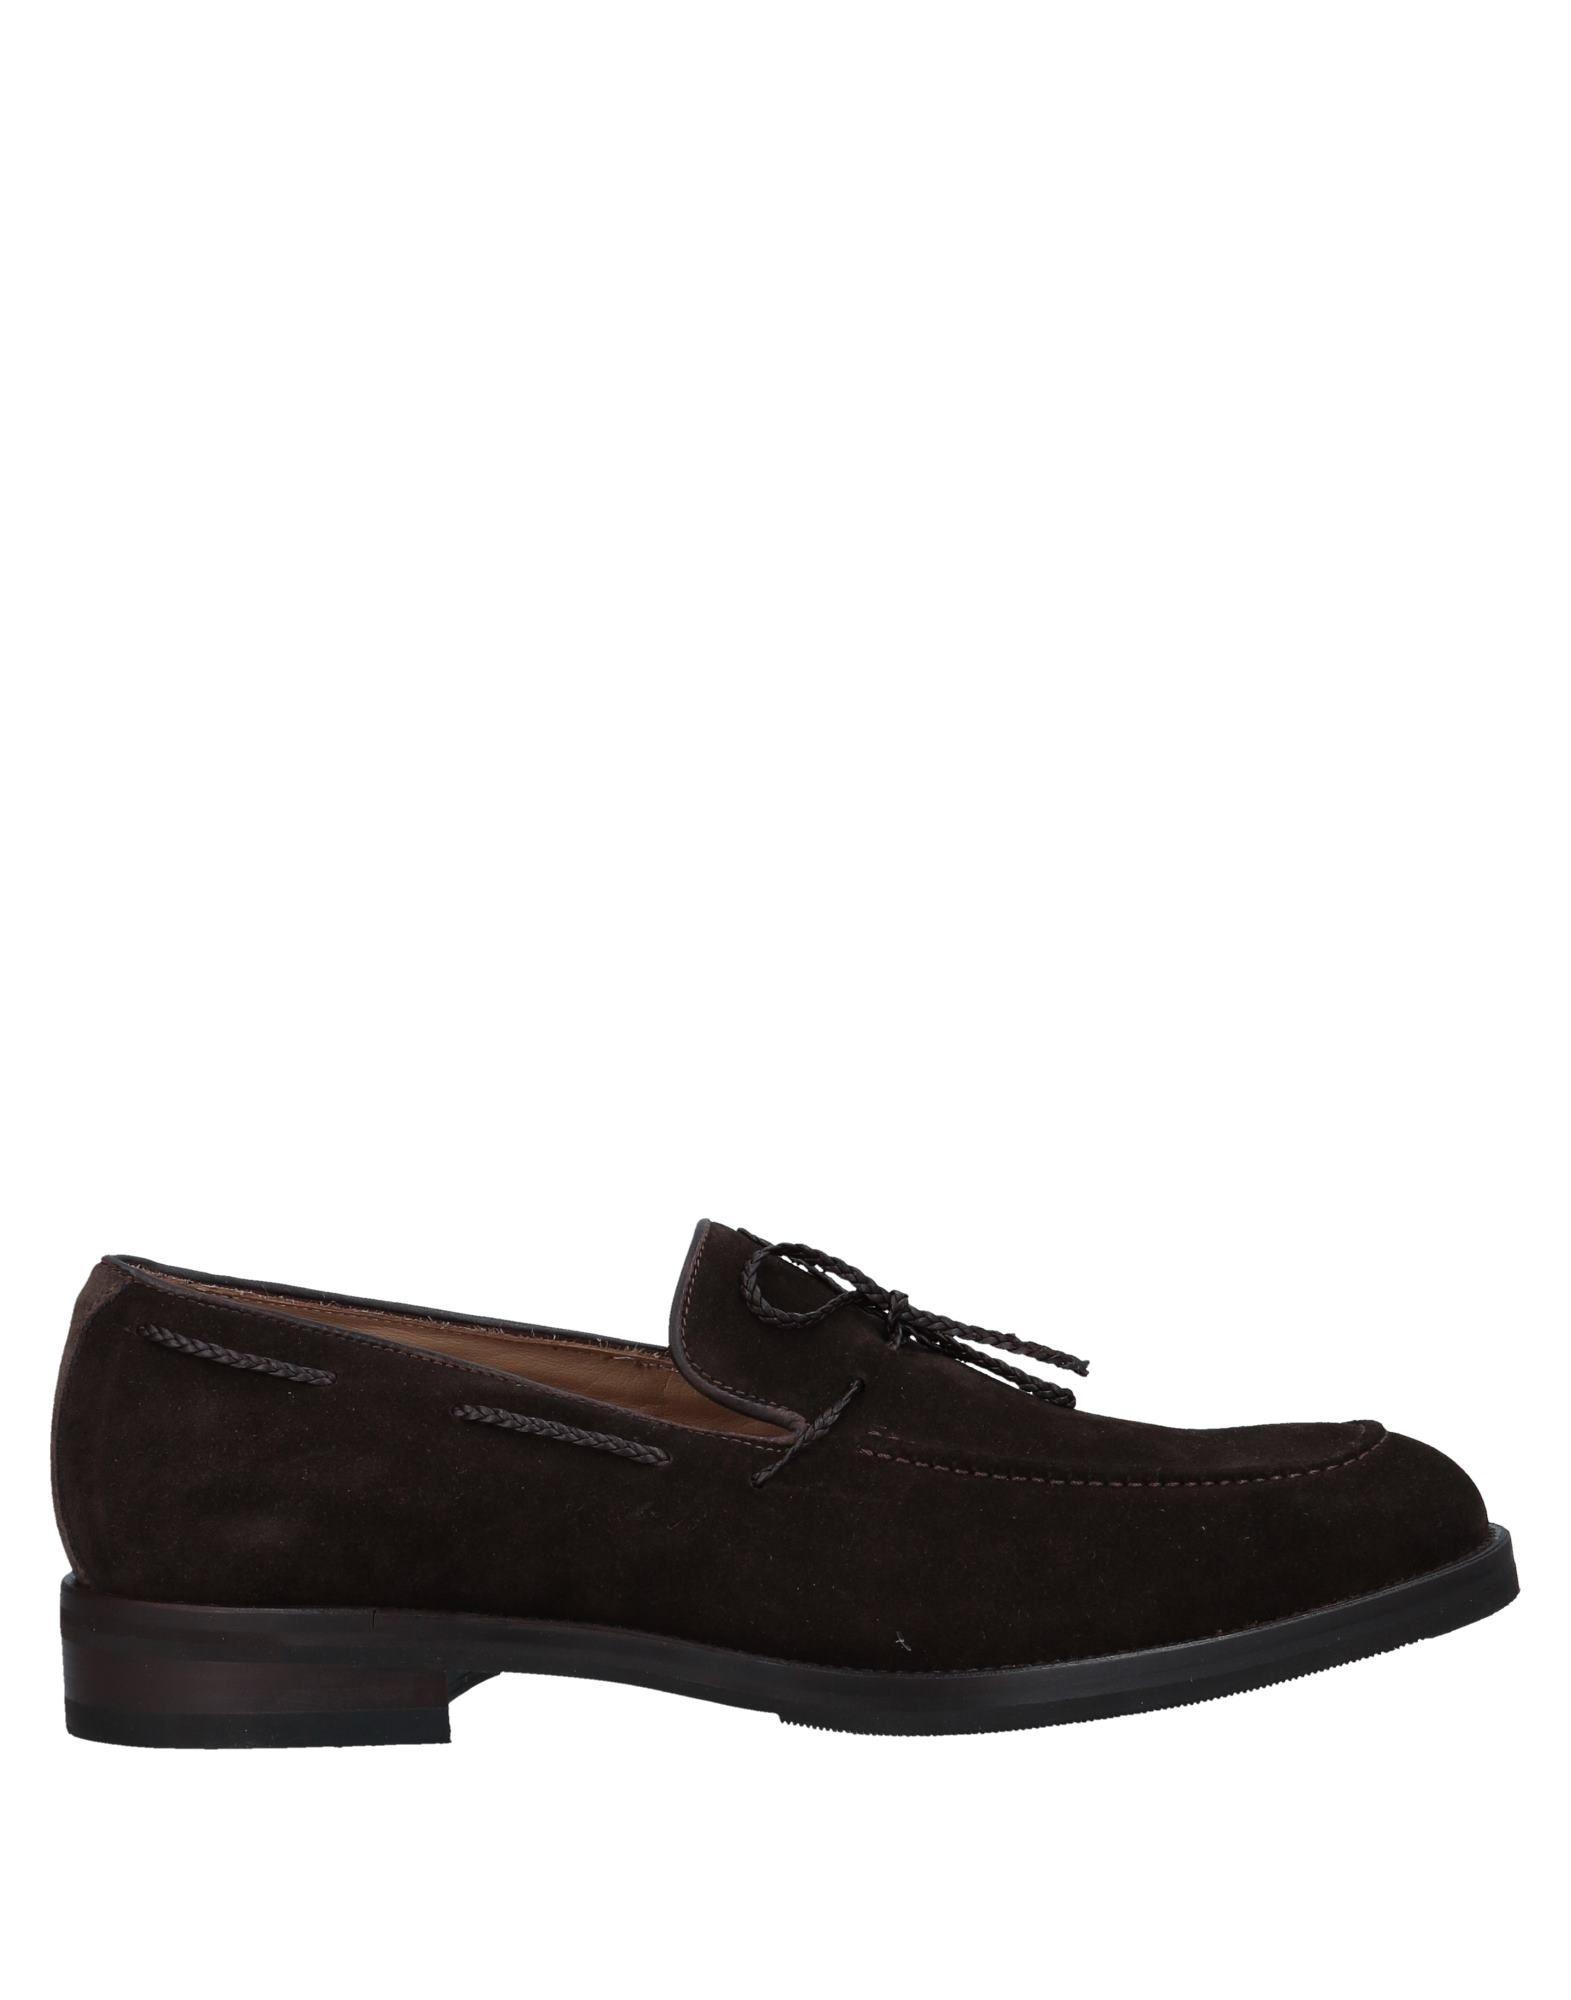 Settantatre Lr Mokassins Herren  11516123RT Gute Qualität beliebte Schuhe